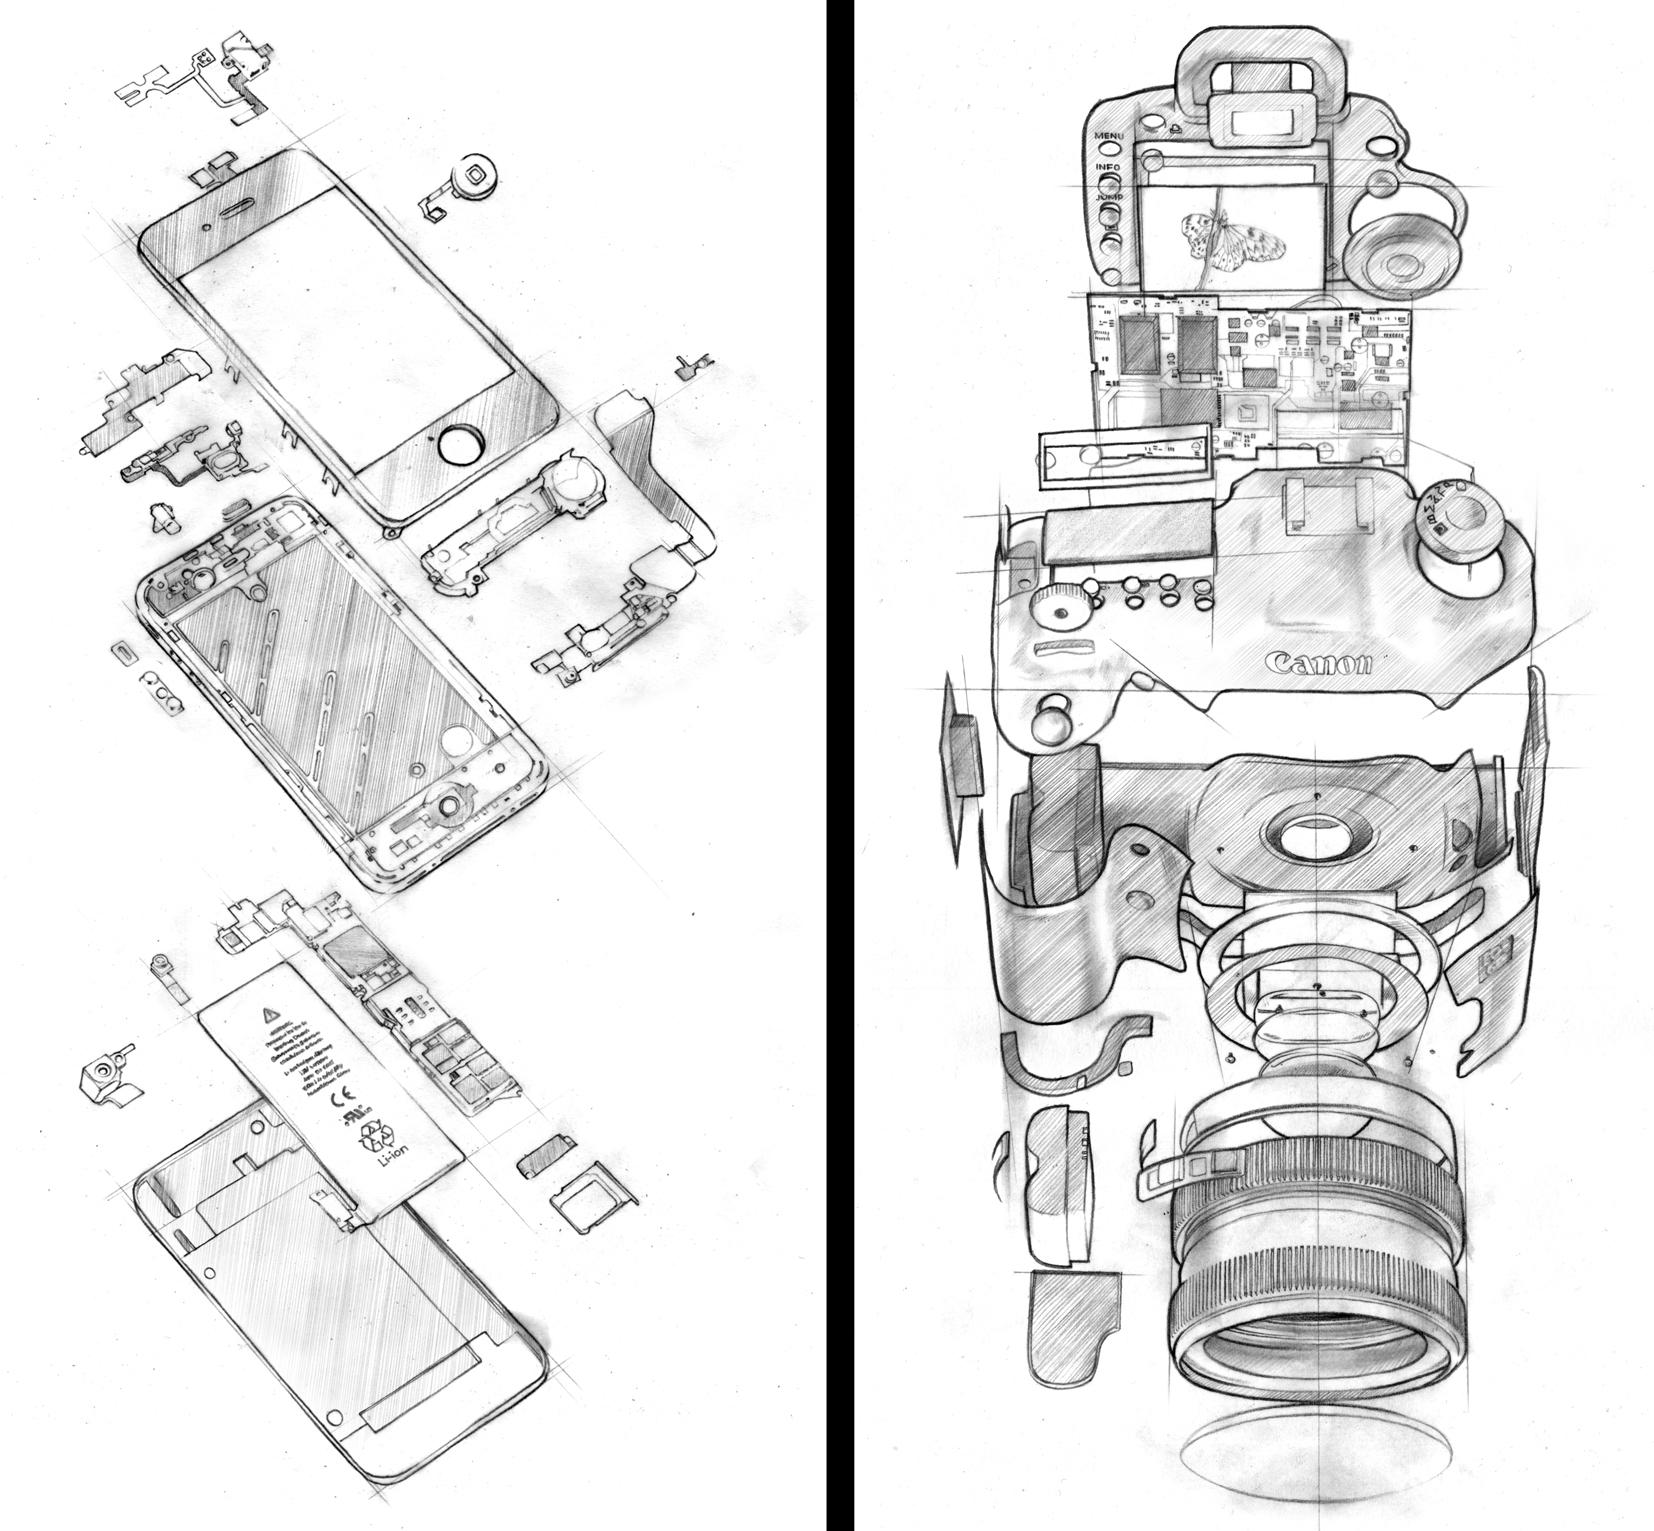 DK iPhone + Canon